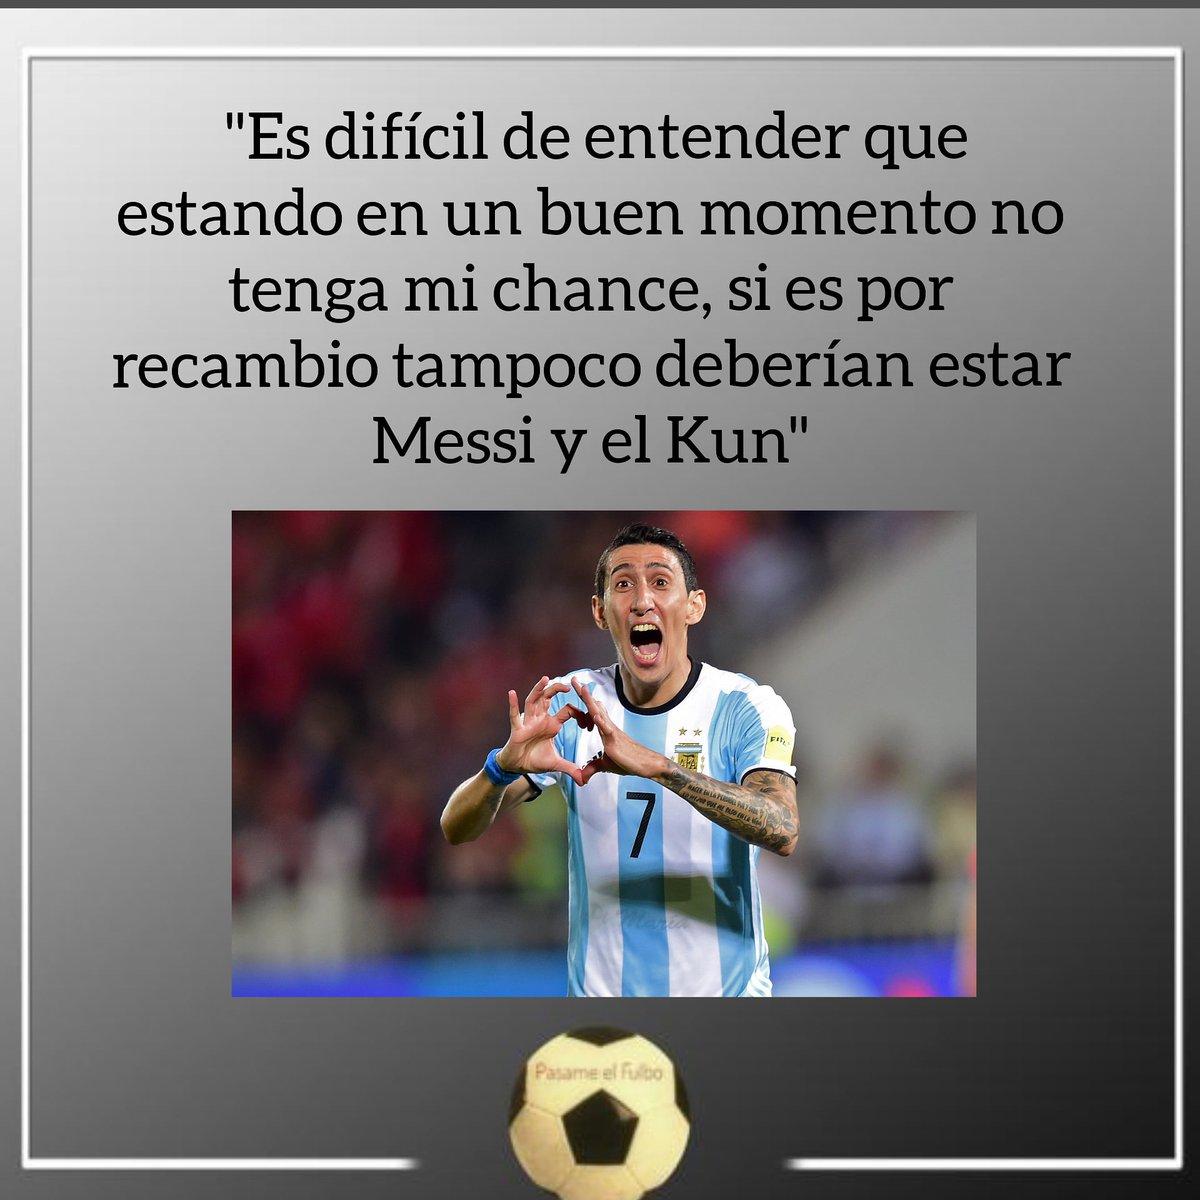 Estas de acuerdo con fideo ? . . . . .  . Mucho pero mucho más Fúlbo en Instagram .    👇👇👇 . @pasameelfulbo desde 🏡 5,8  K  .  ⬆️⬆️⬆️ .  . . . . . #Pasameelfulbo⚽ #Messi #futbol⚽ #barcelona #LaLiga #Cristiano #Maradona #boca  #Riverplate #sanlorenzo #ibrahimovic #SerieA https://t.co/hbnY07ucGv